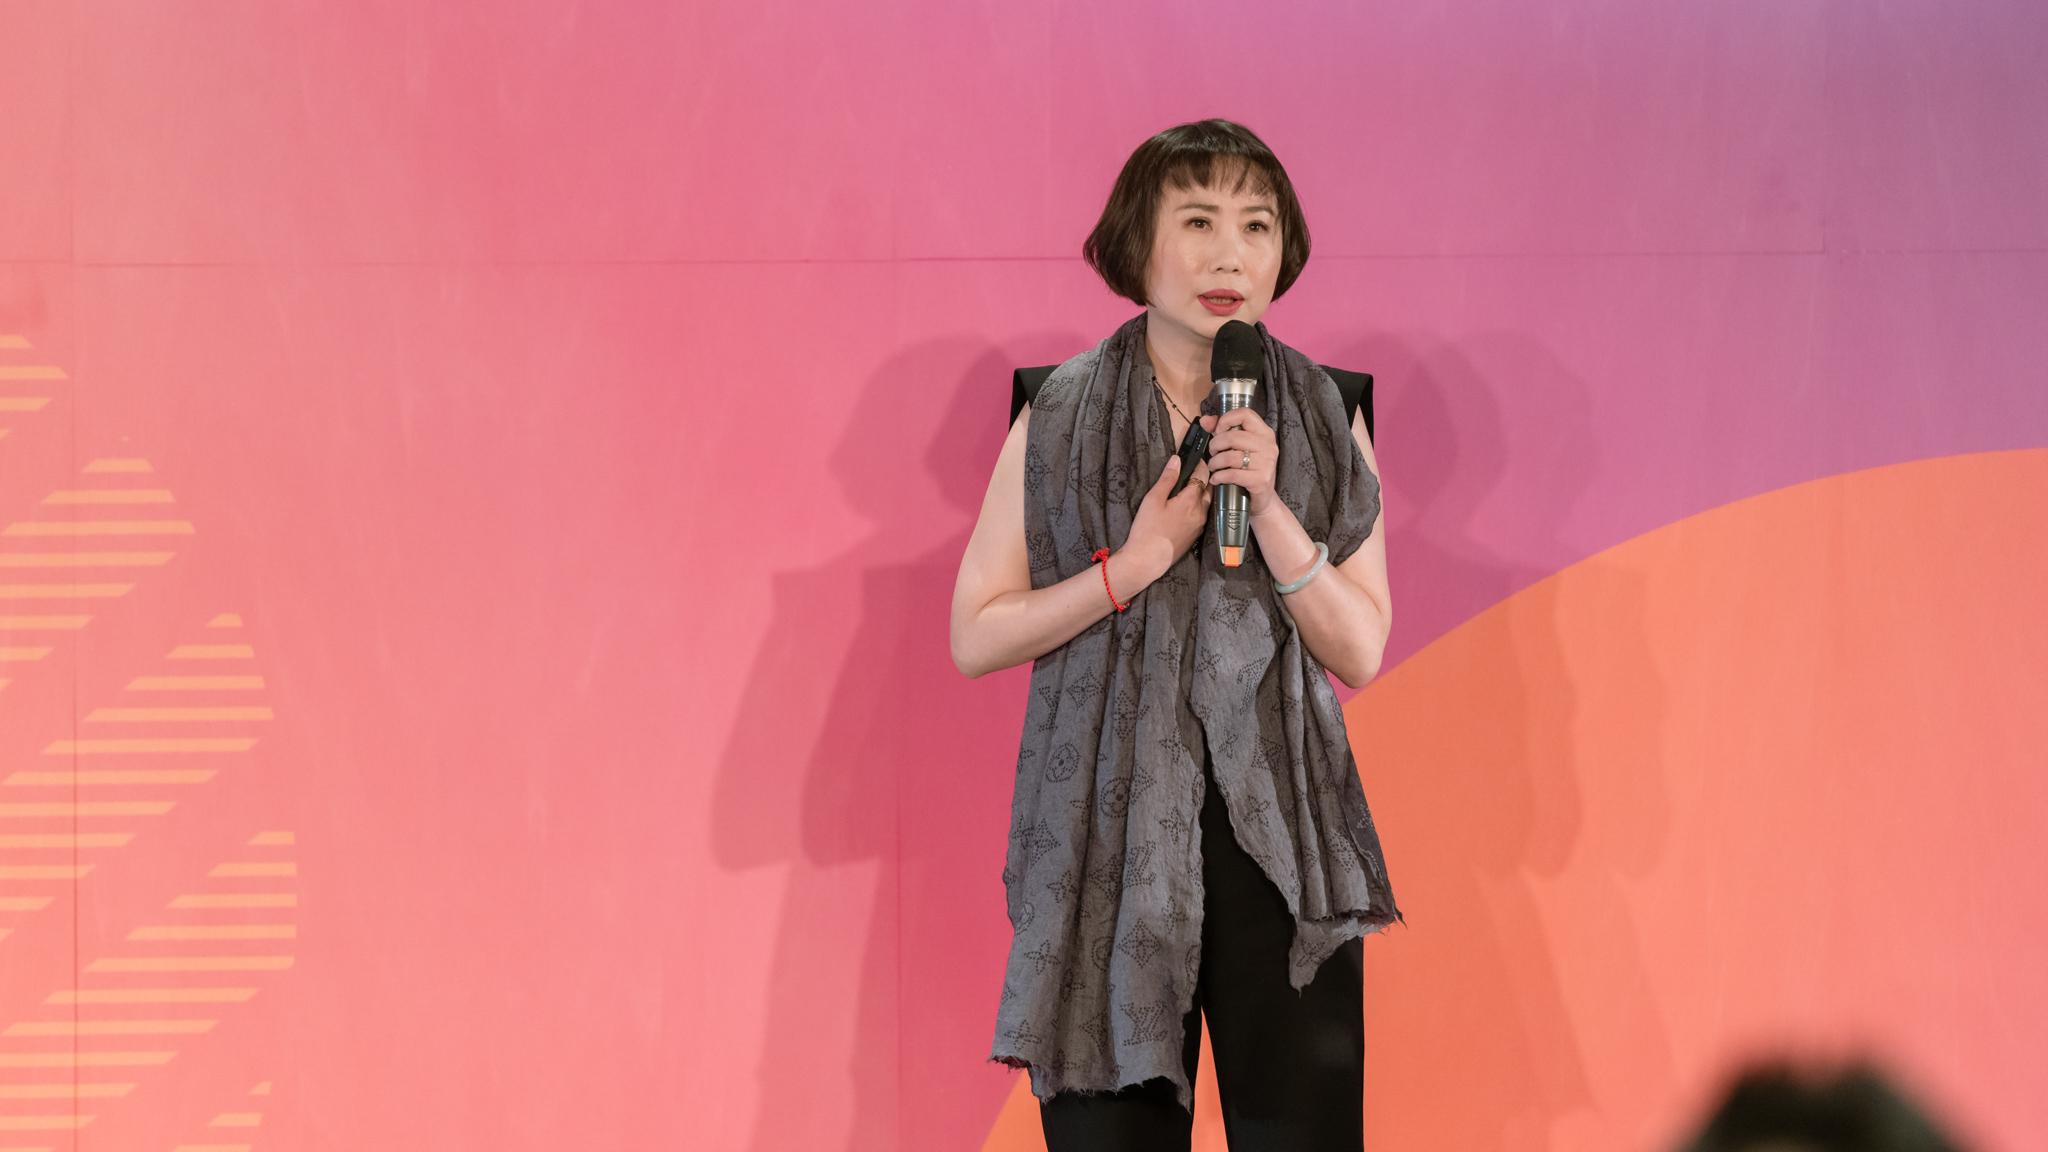 MAKE UP FOR EVER 總經理 陳佩琳於 OMO 品牌新零售高峰會